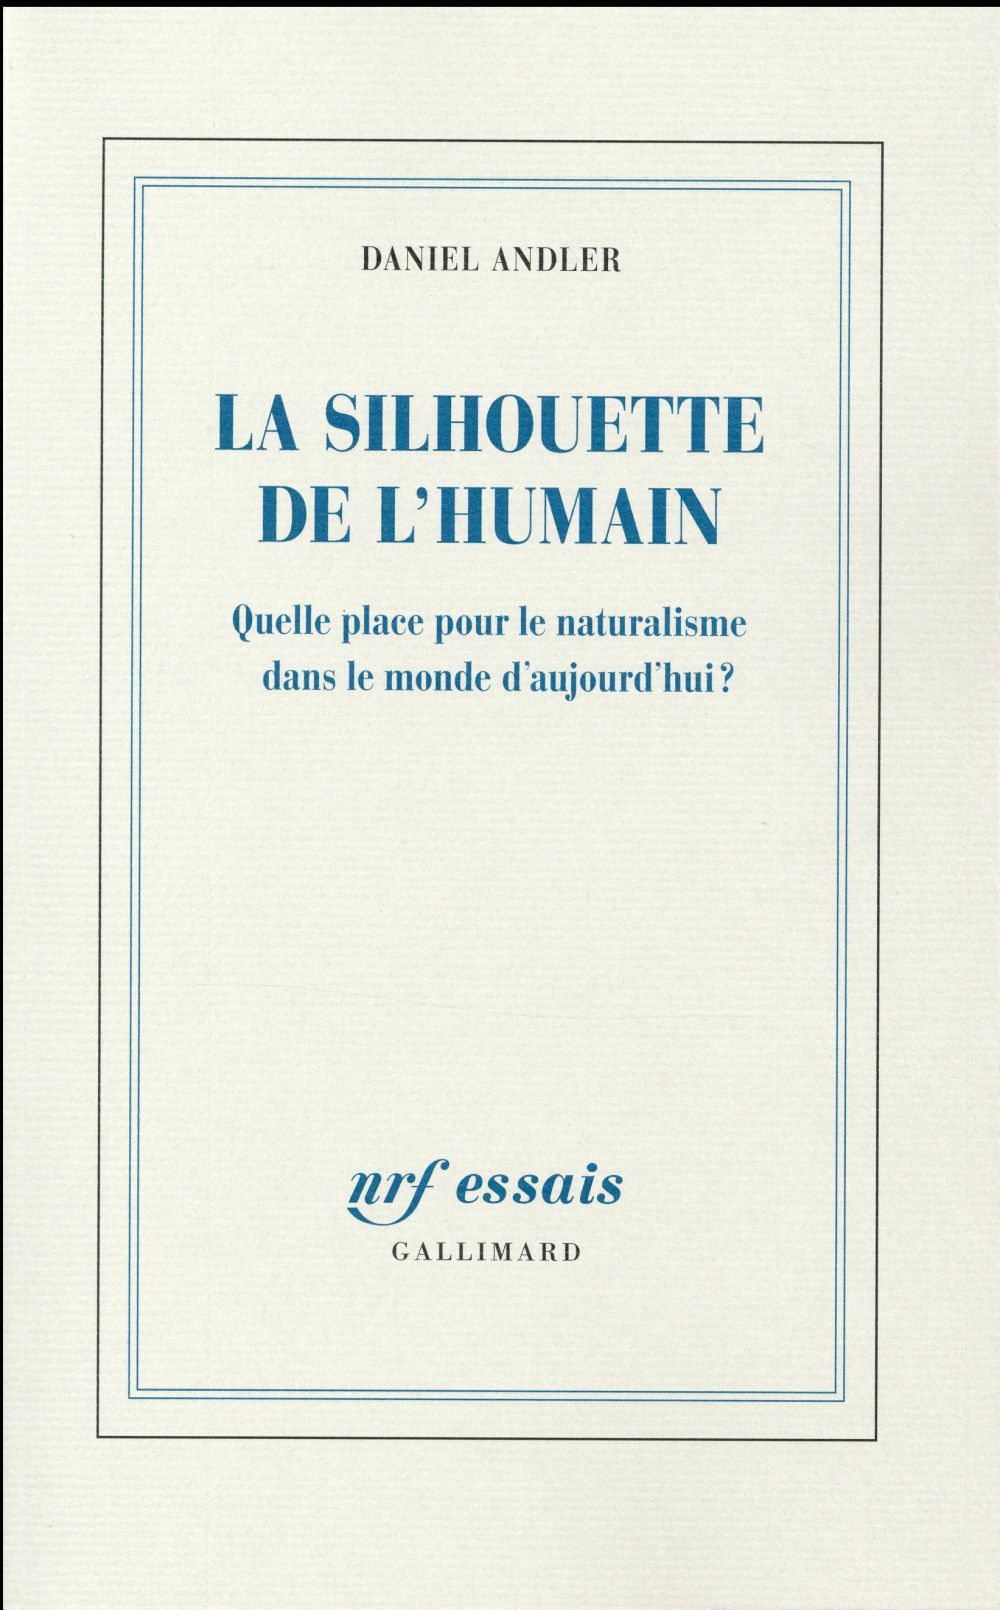 La silhouette de l'humain